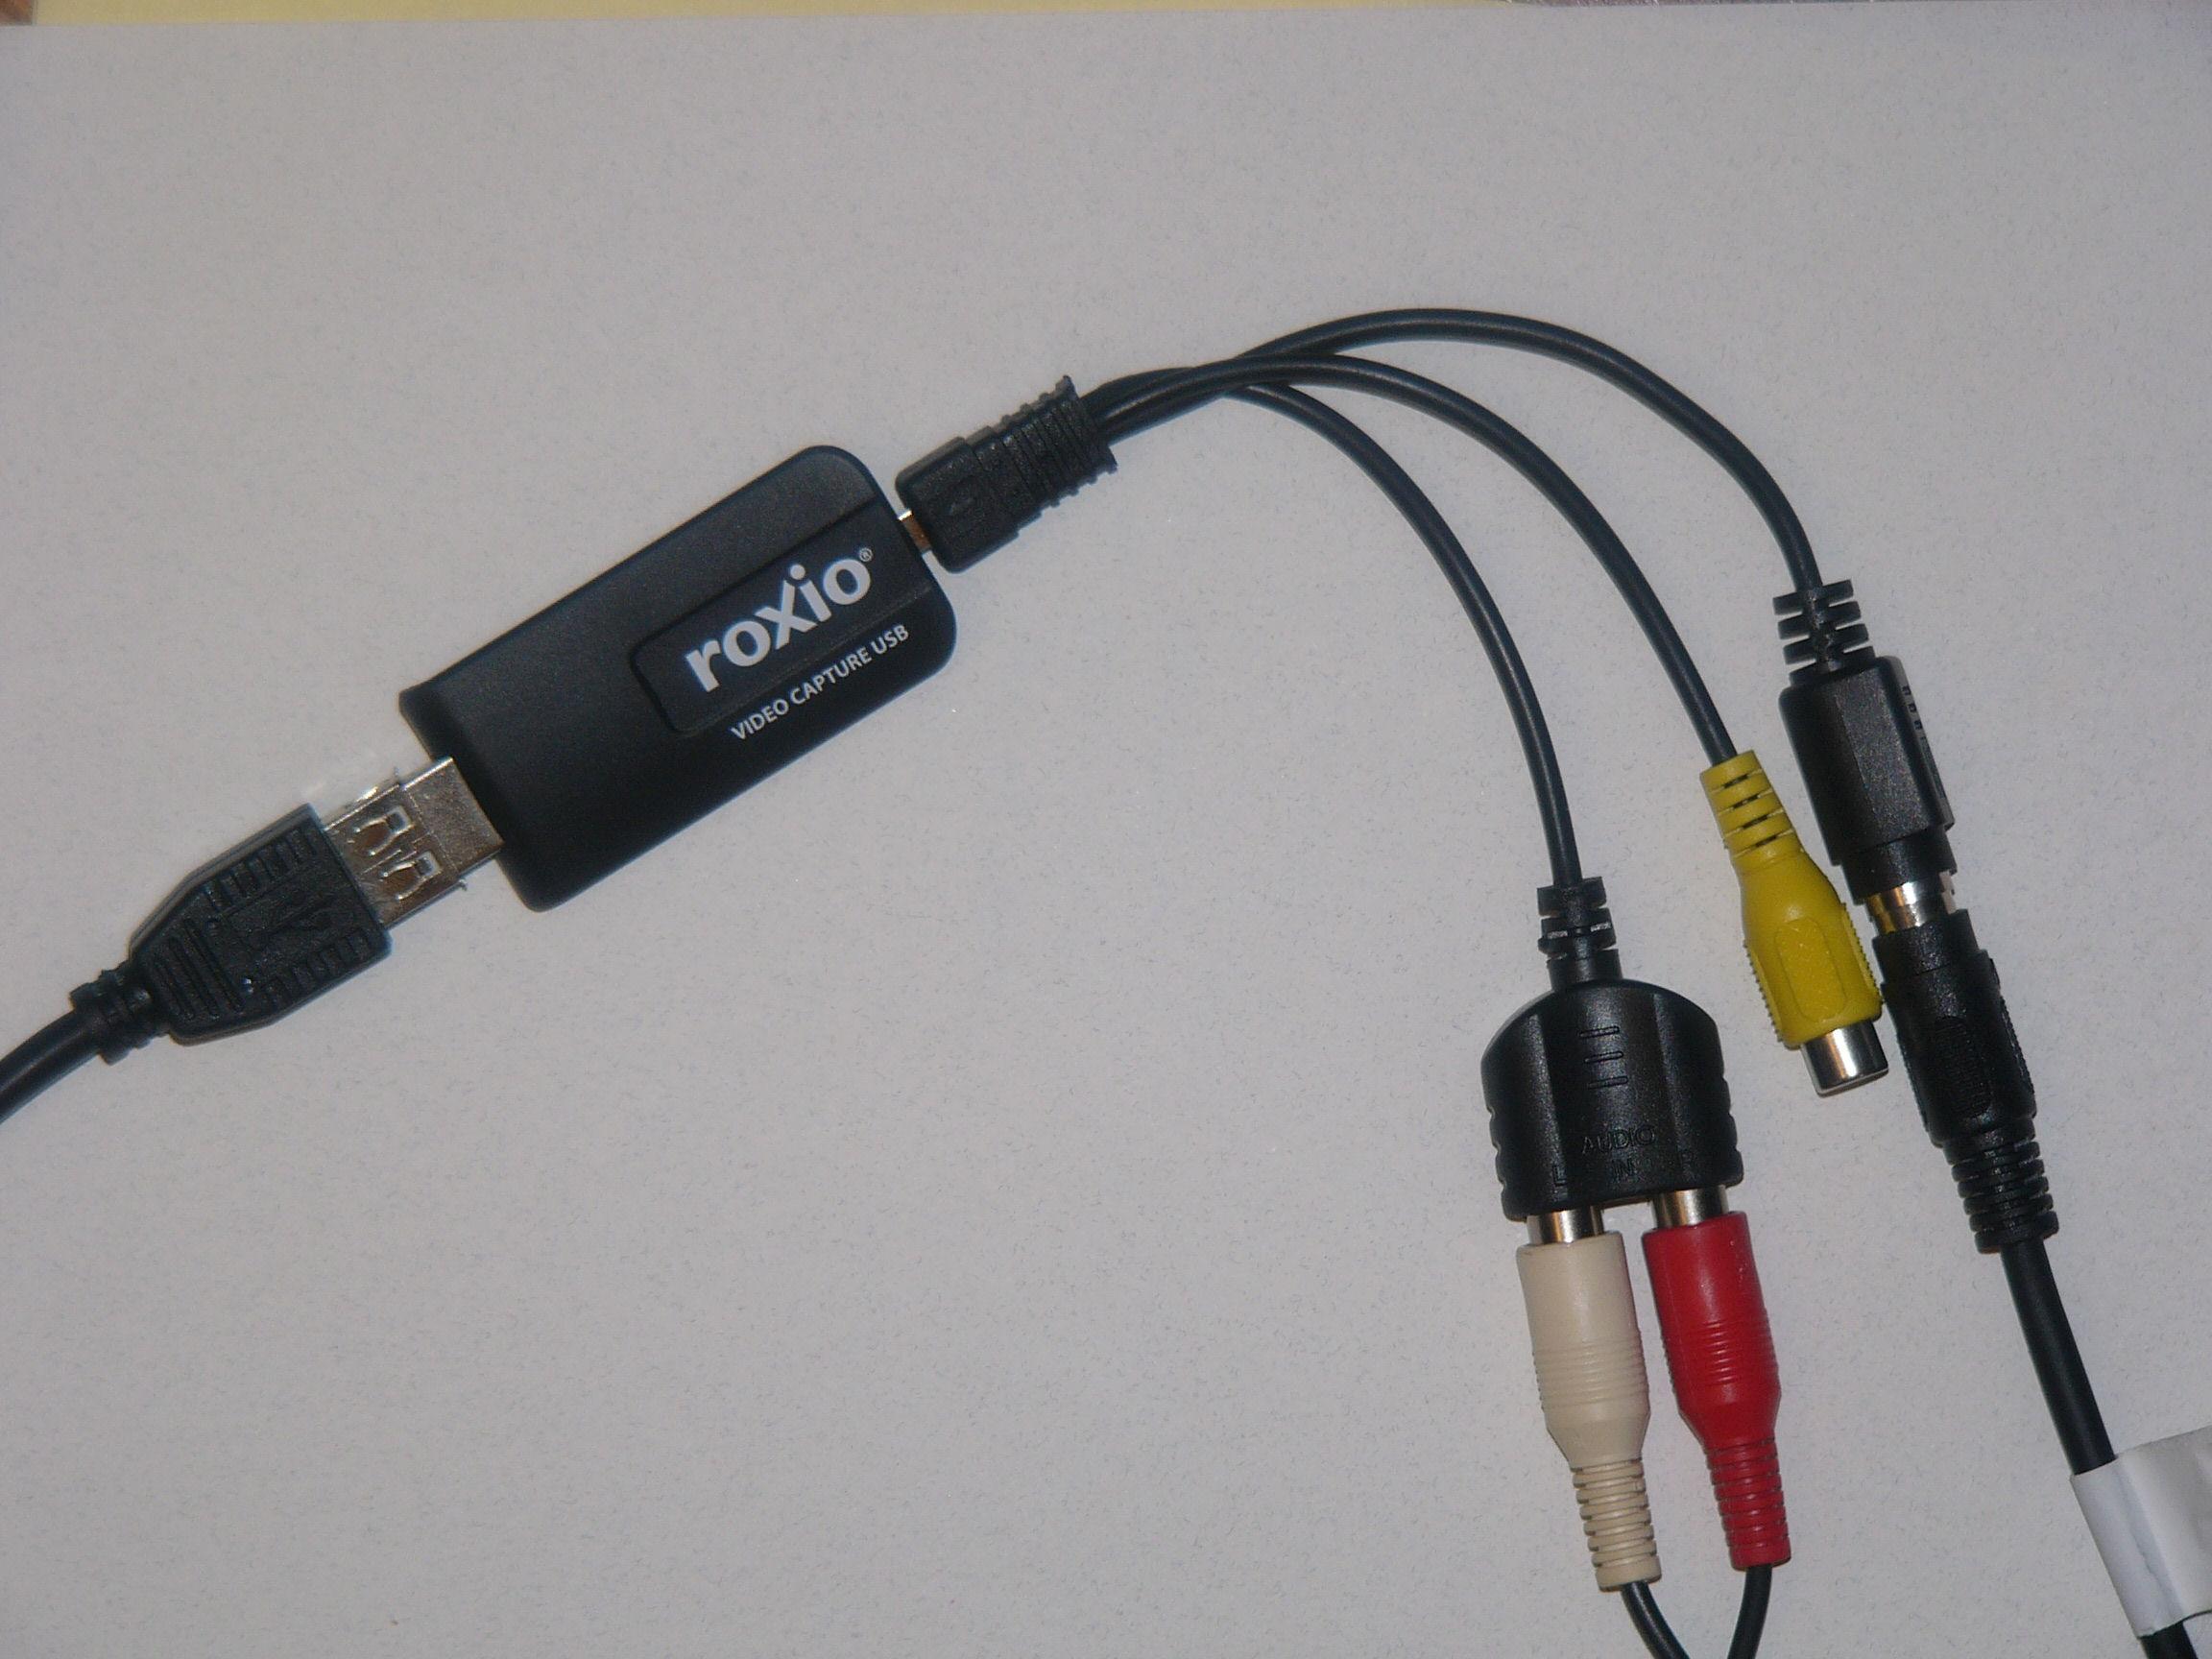 ROXIO USB CAPTURE WINDOWS XP DRIVER